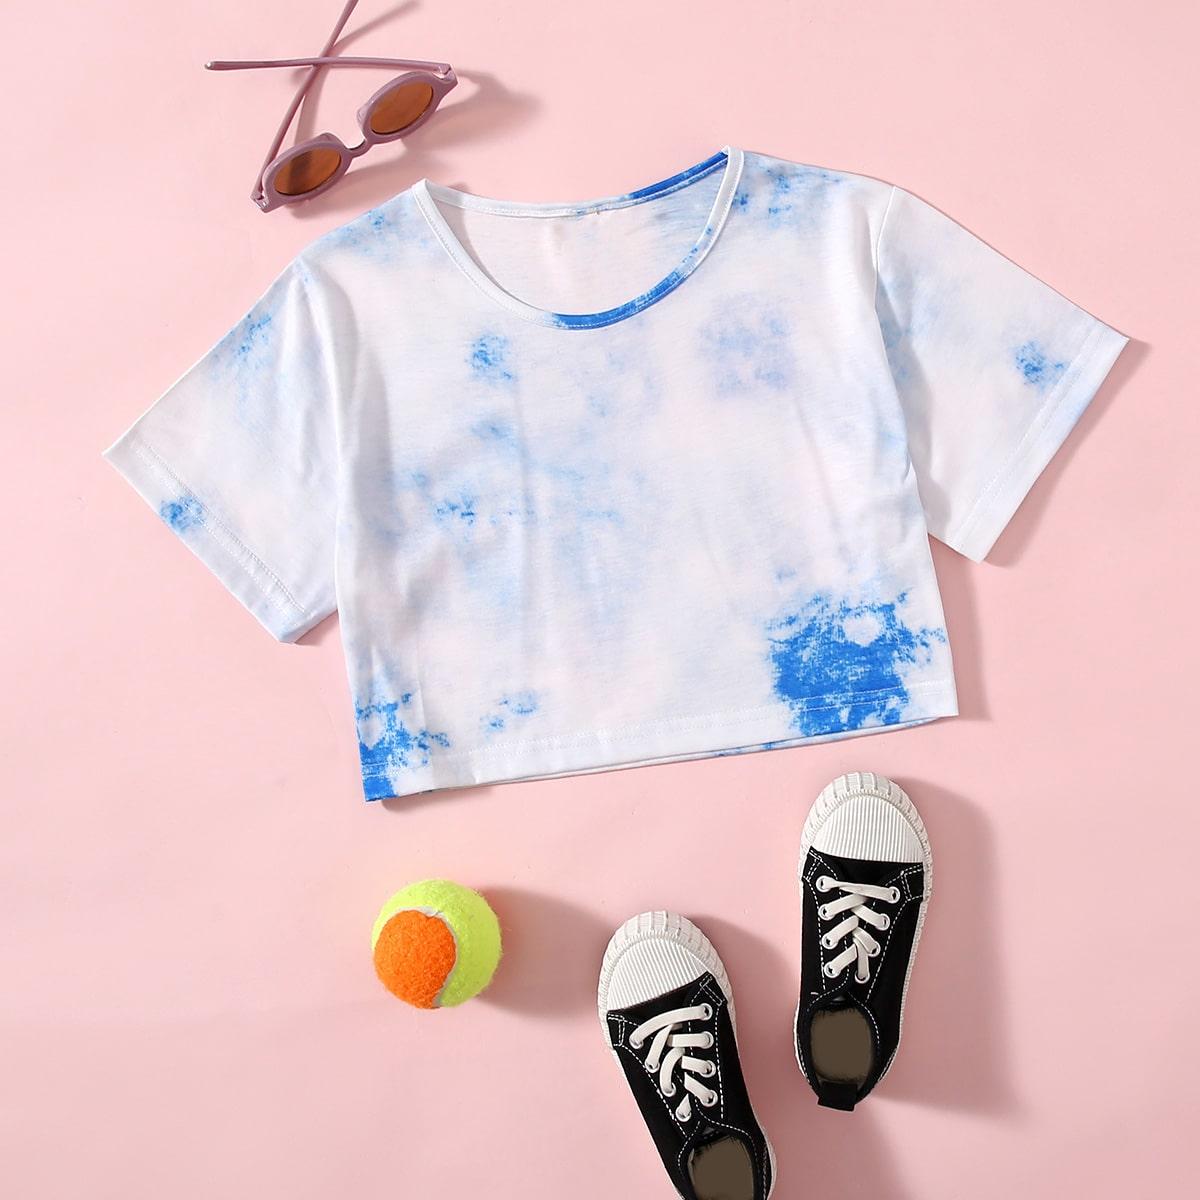 Camiseta de tie dye